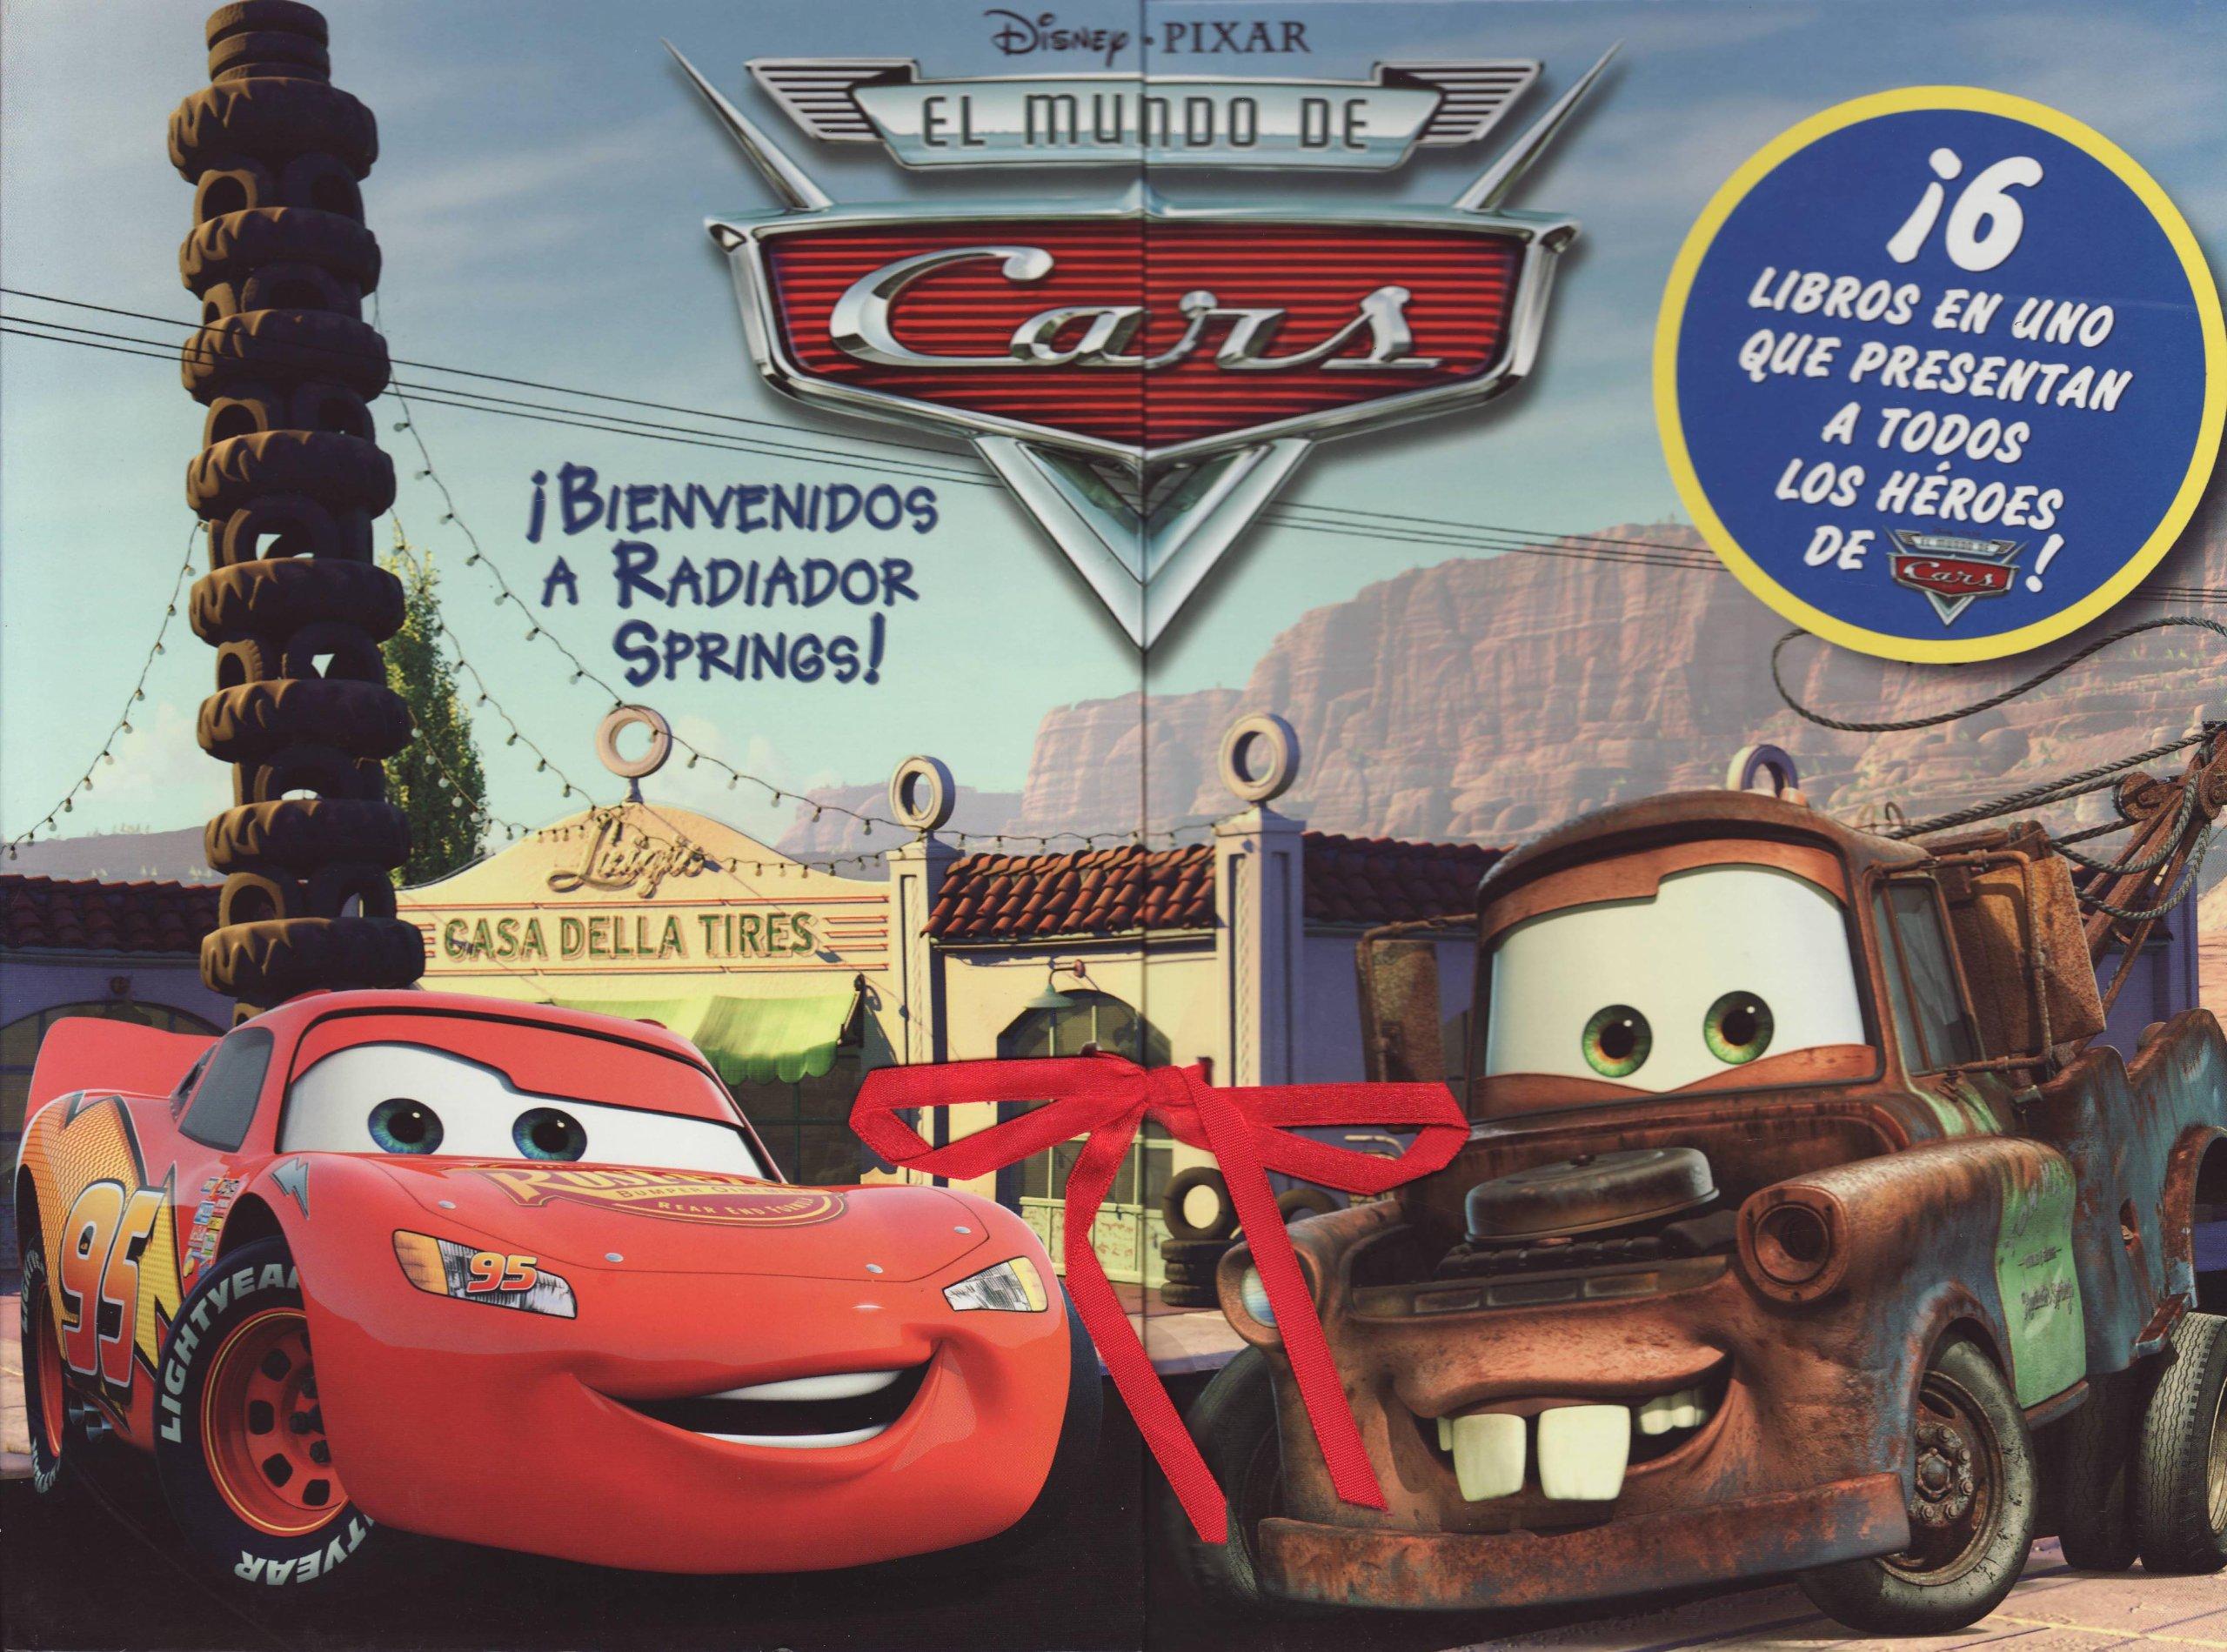 Download Bienvenidos a Radiador Springs / Welcome to Radiator Springs (El mundo de cars/ The Car's World) (Spanish Edition) pdf epub